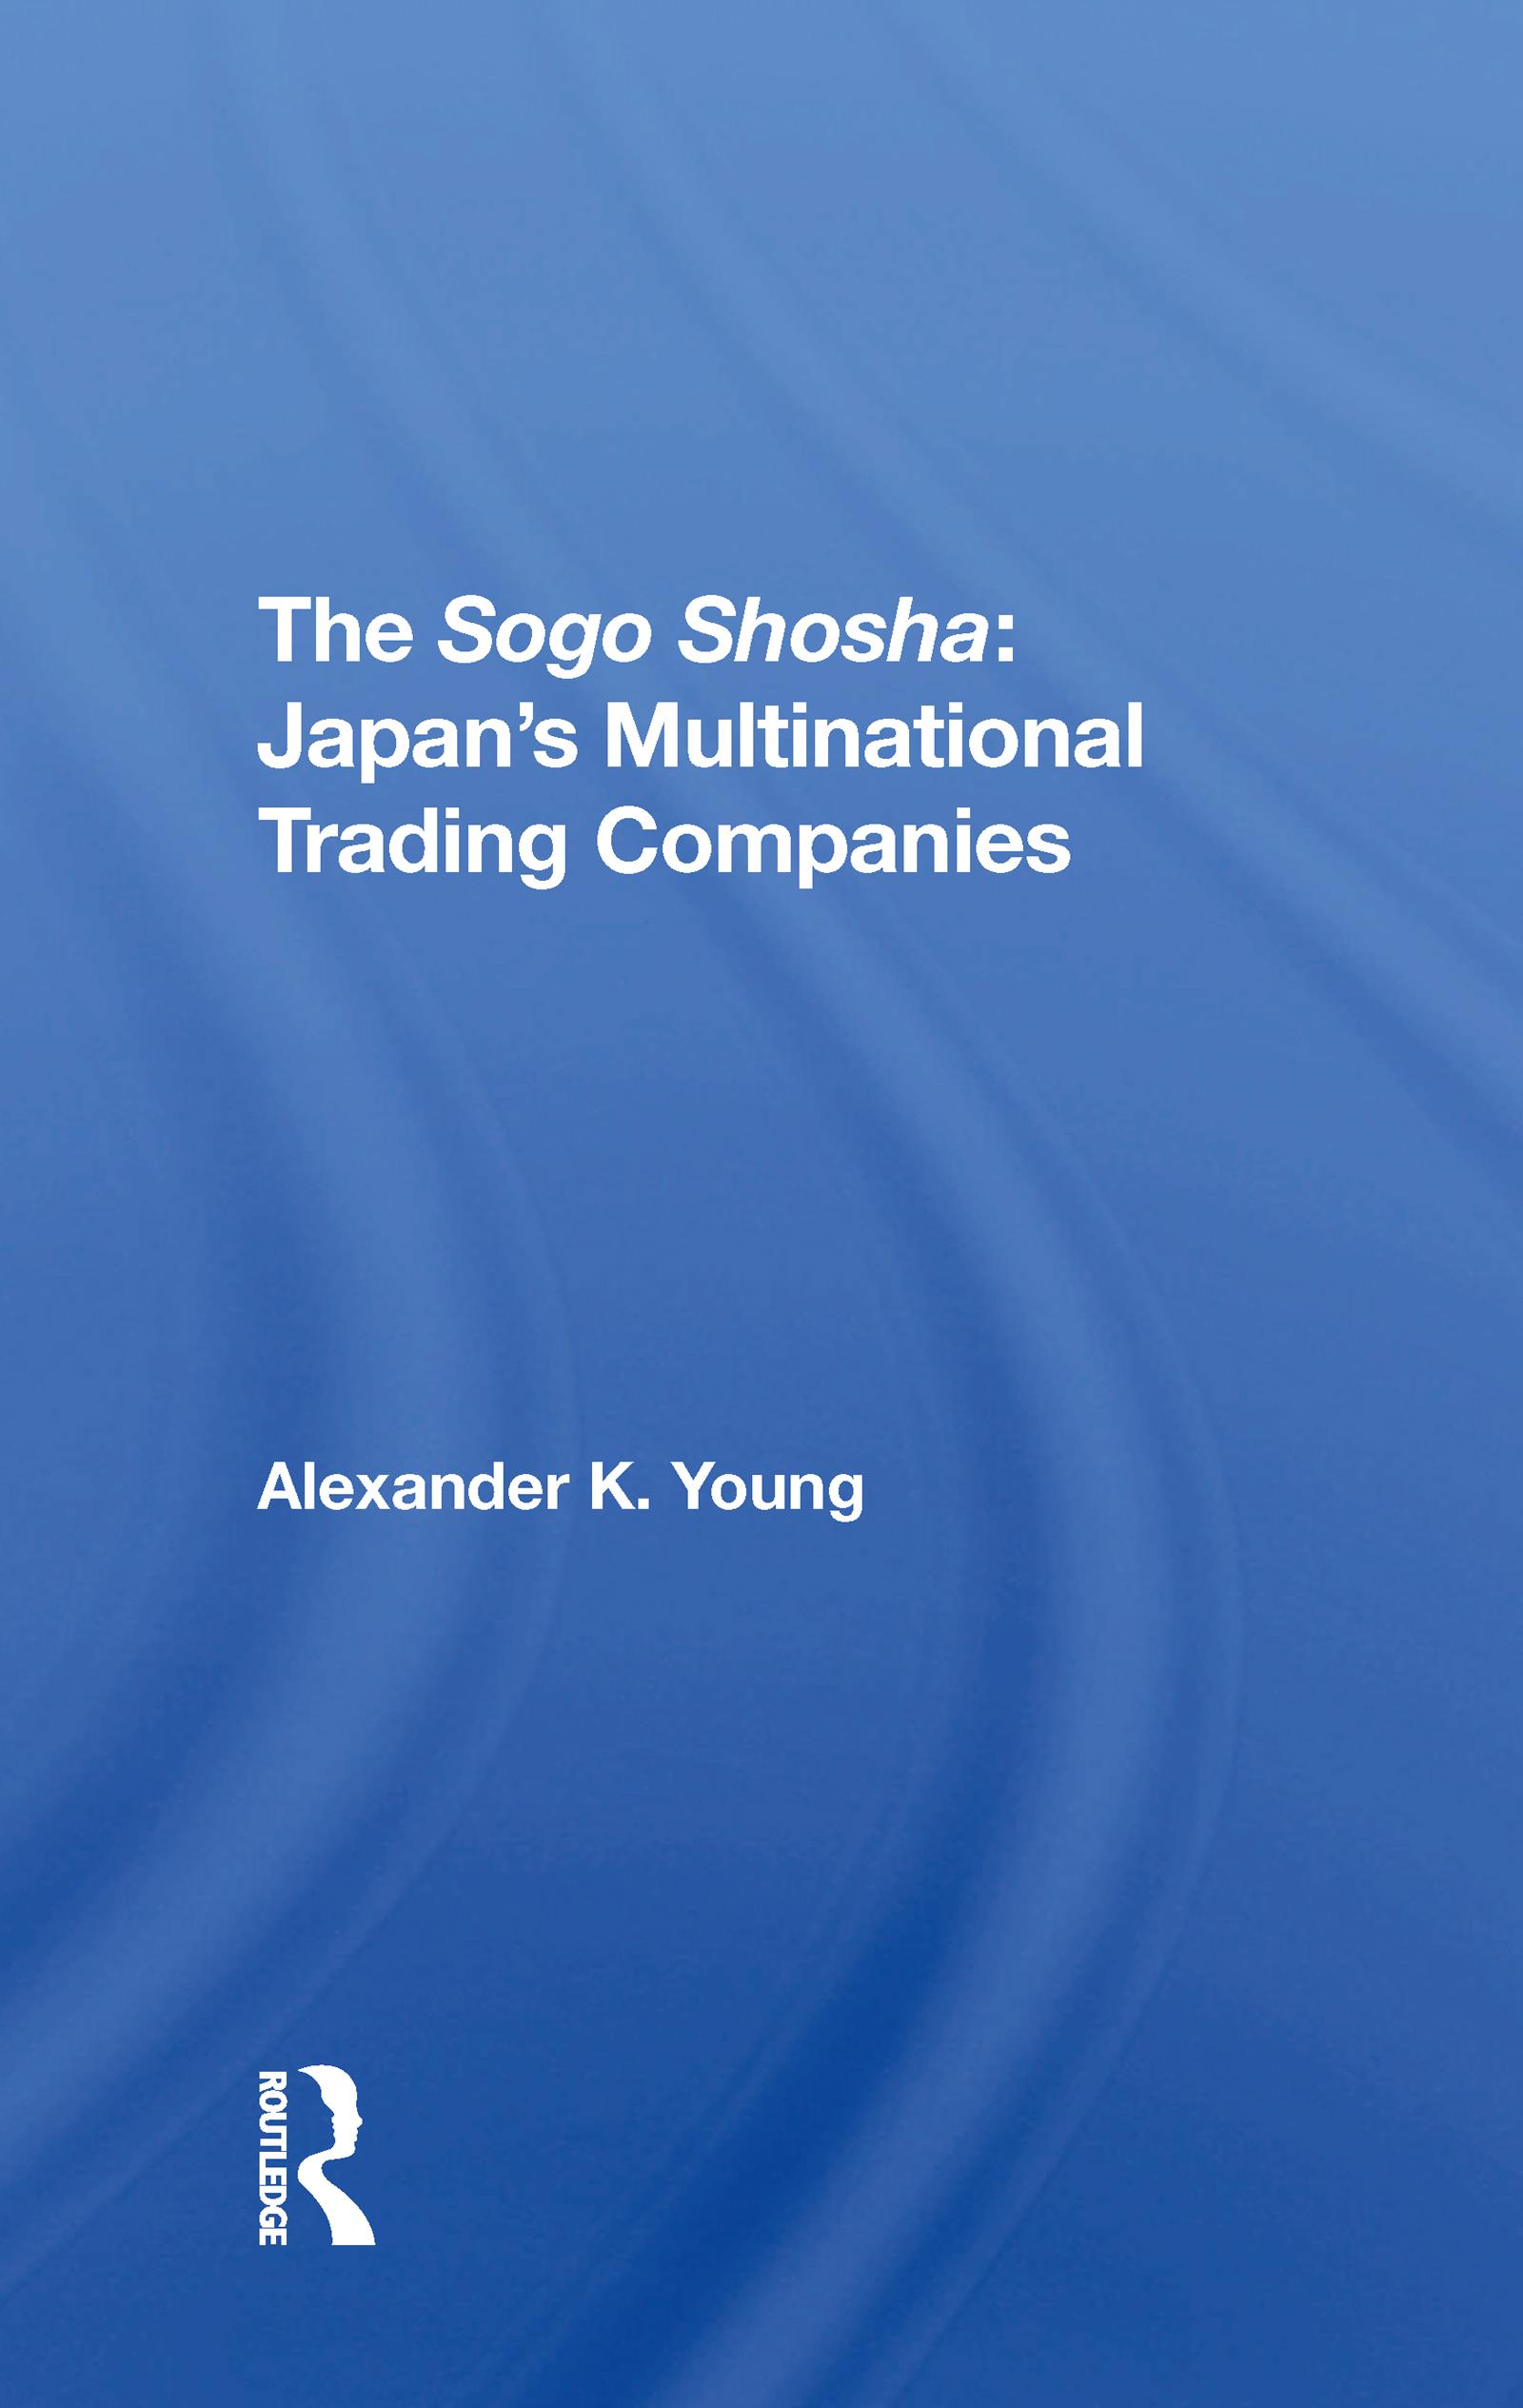 The Sogo Shosha